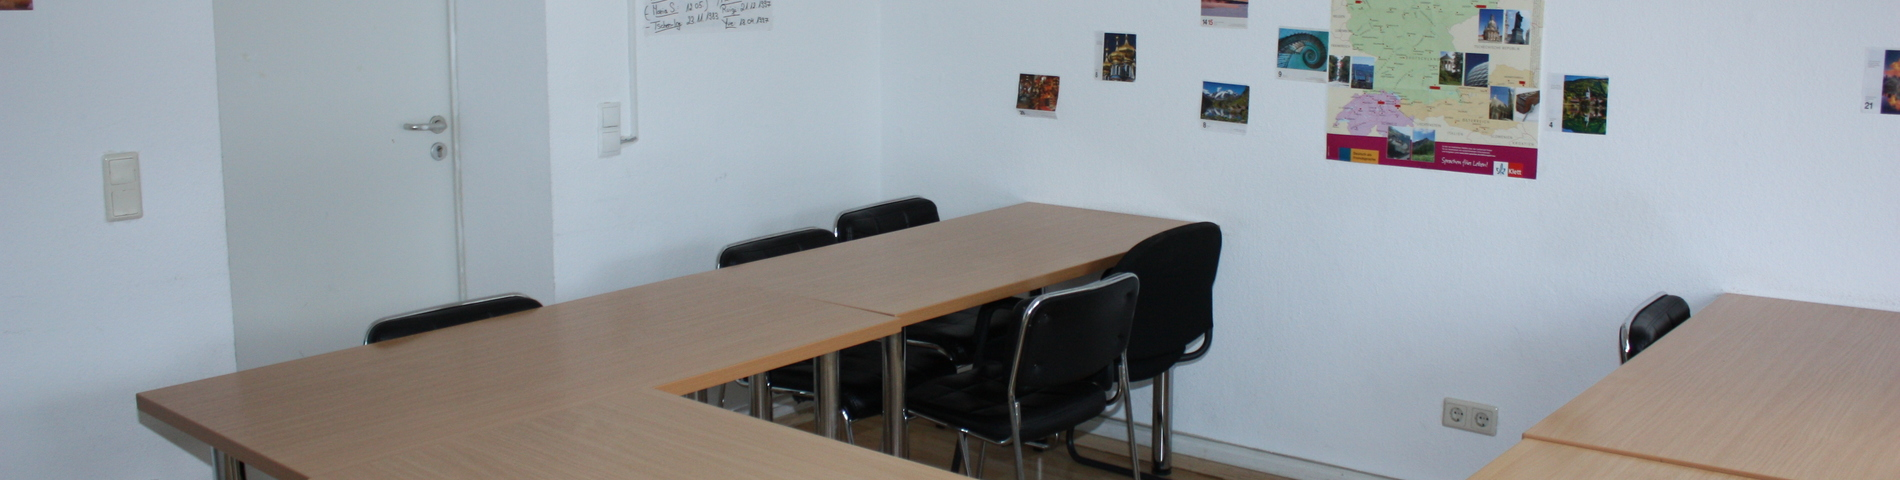 Steinke Institut foto 1